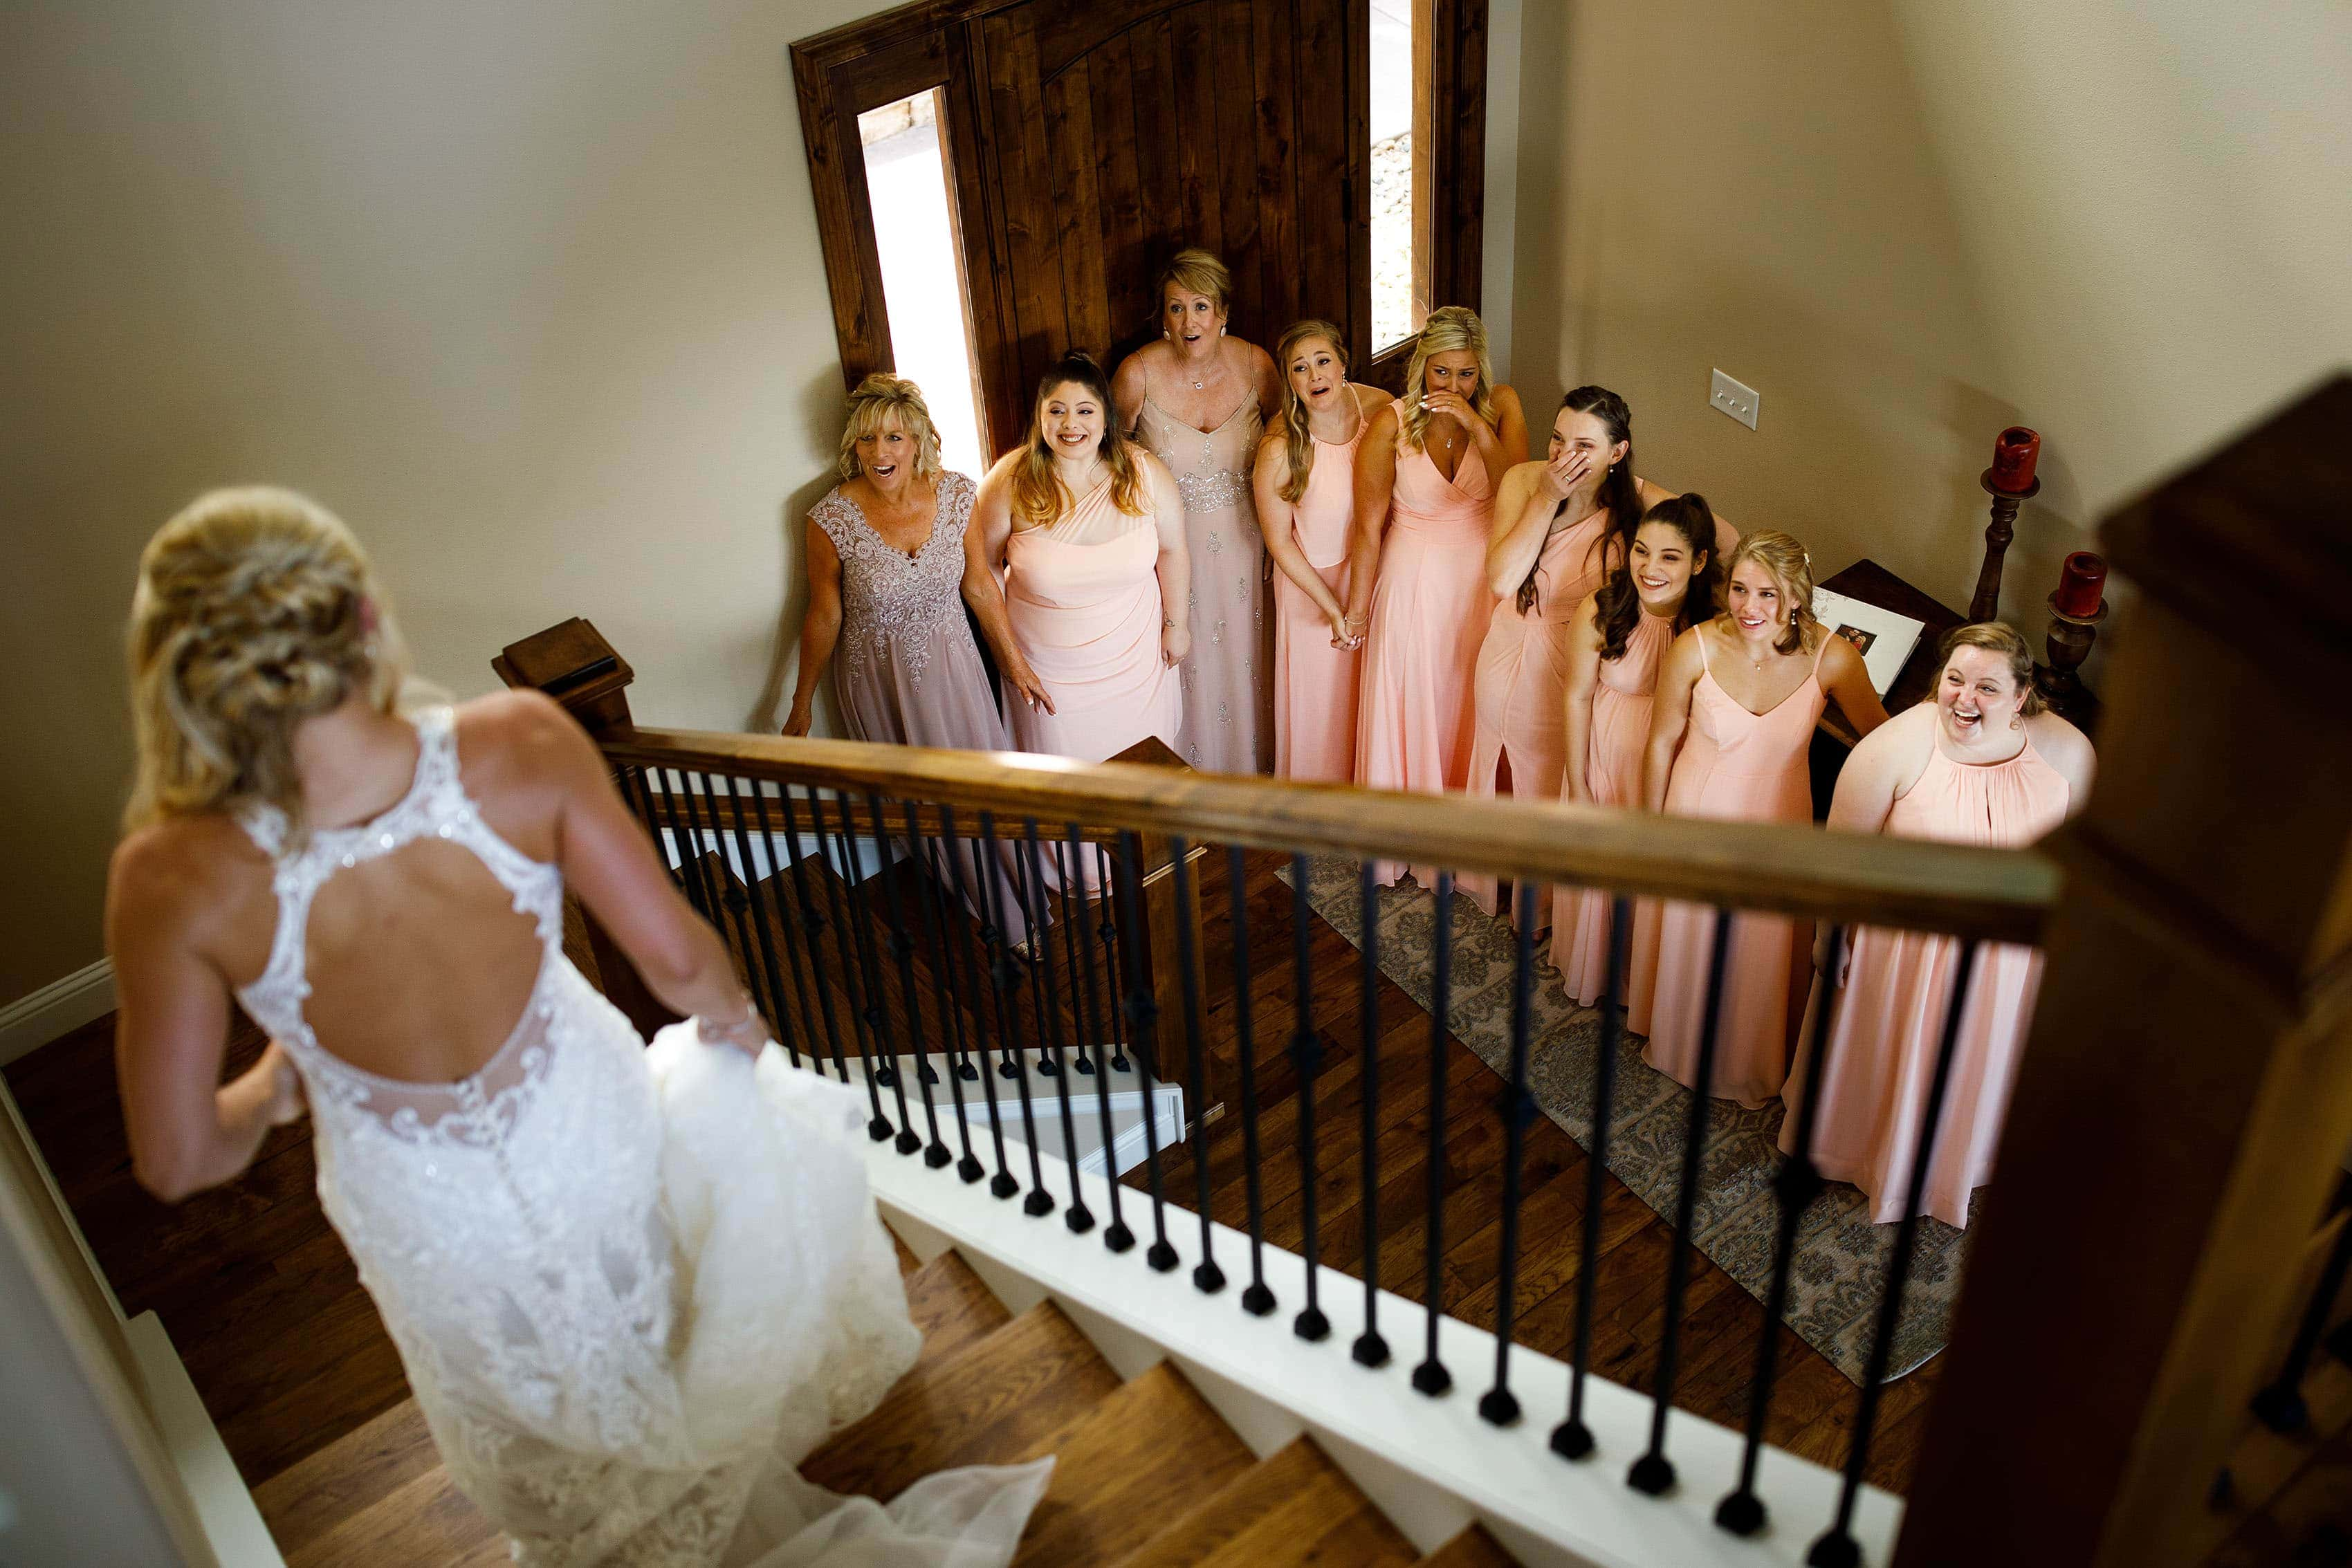 The bride descends a staircase as bridesmaids look on